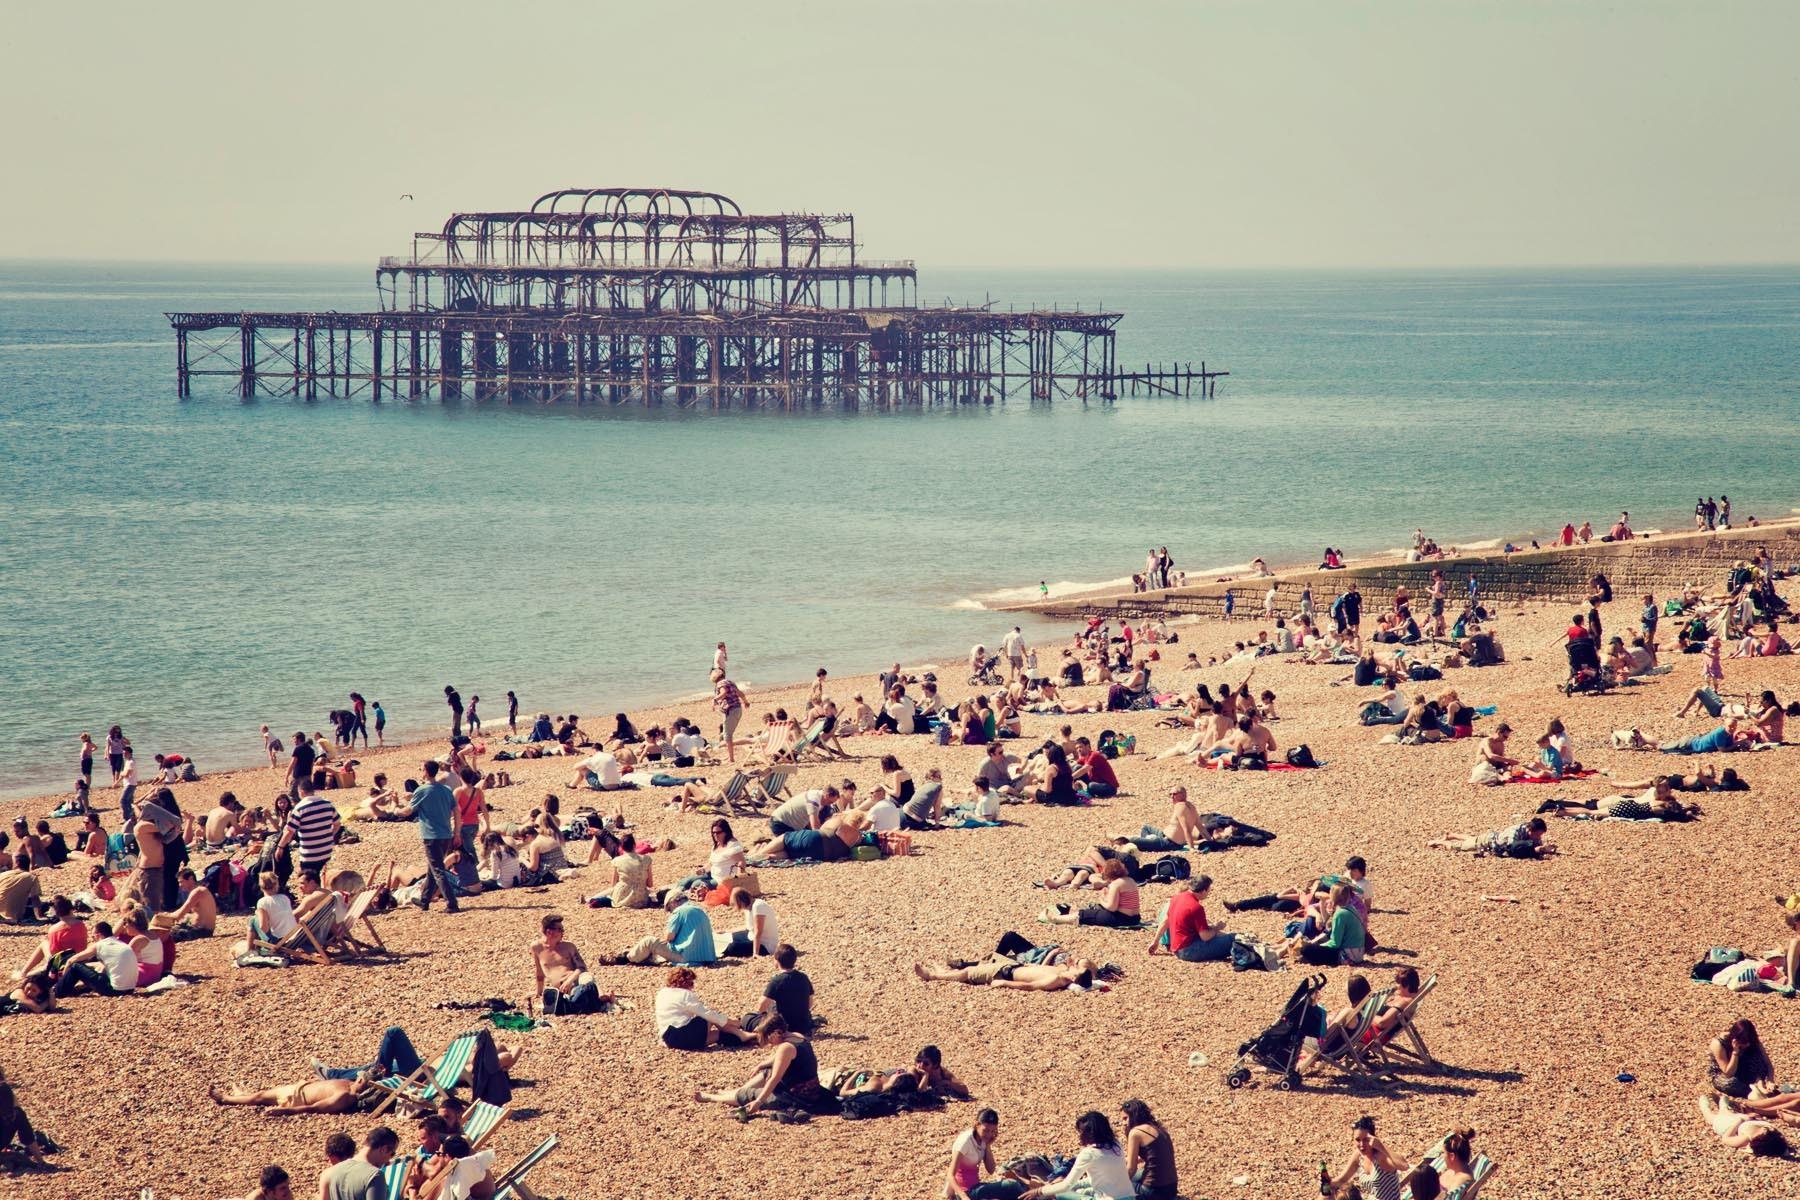 West Pier, Brighton, East Sussex, England